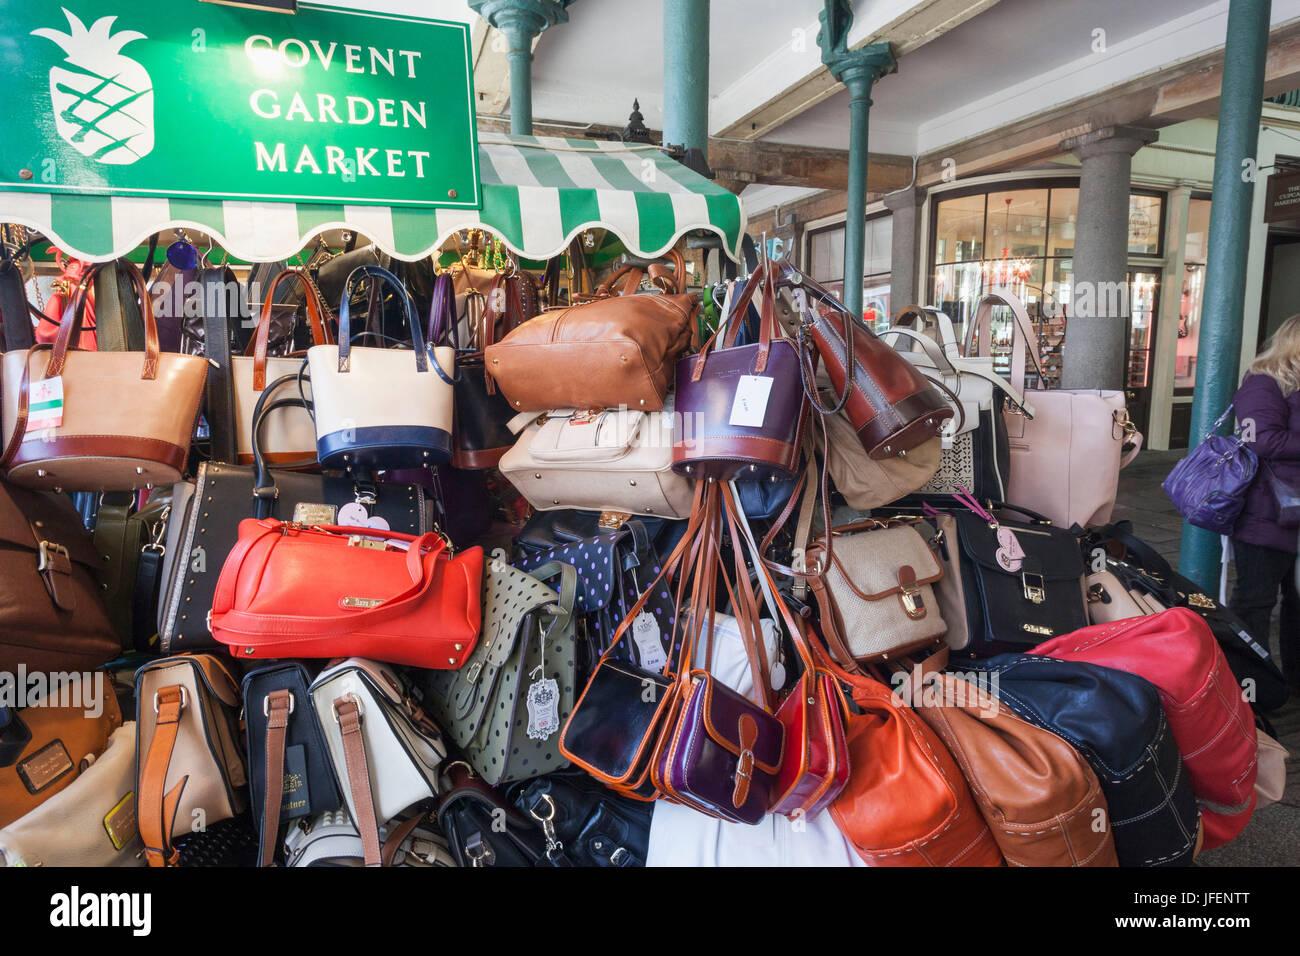 Women s Handbags Stock Photos   Women s Handbags Stock Images - Alamy eb2c33f4297e0